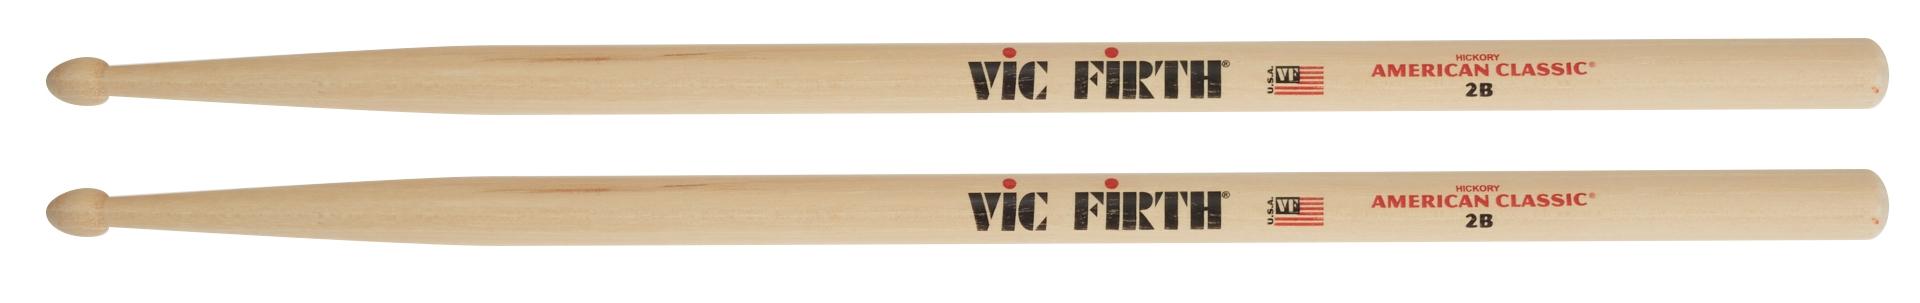 VIC FIRTH 2B American Classic